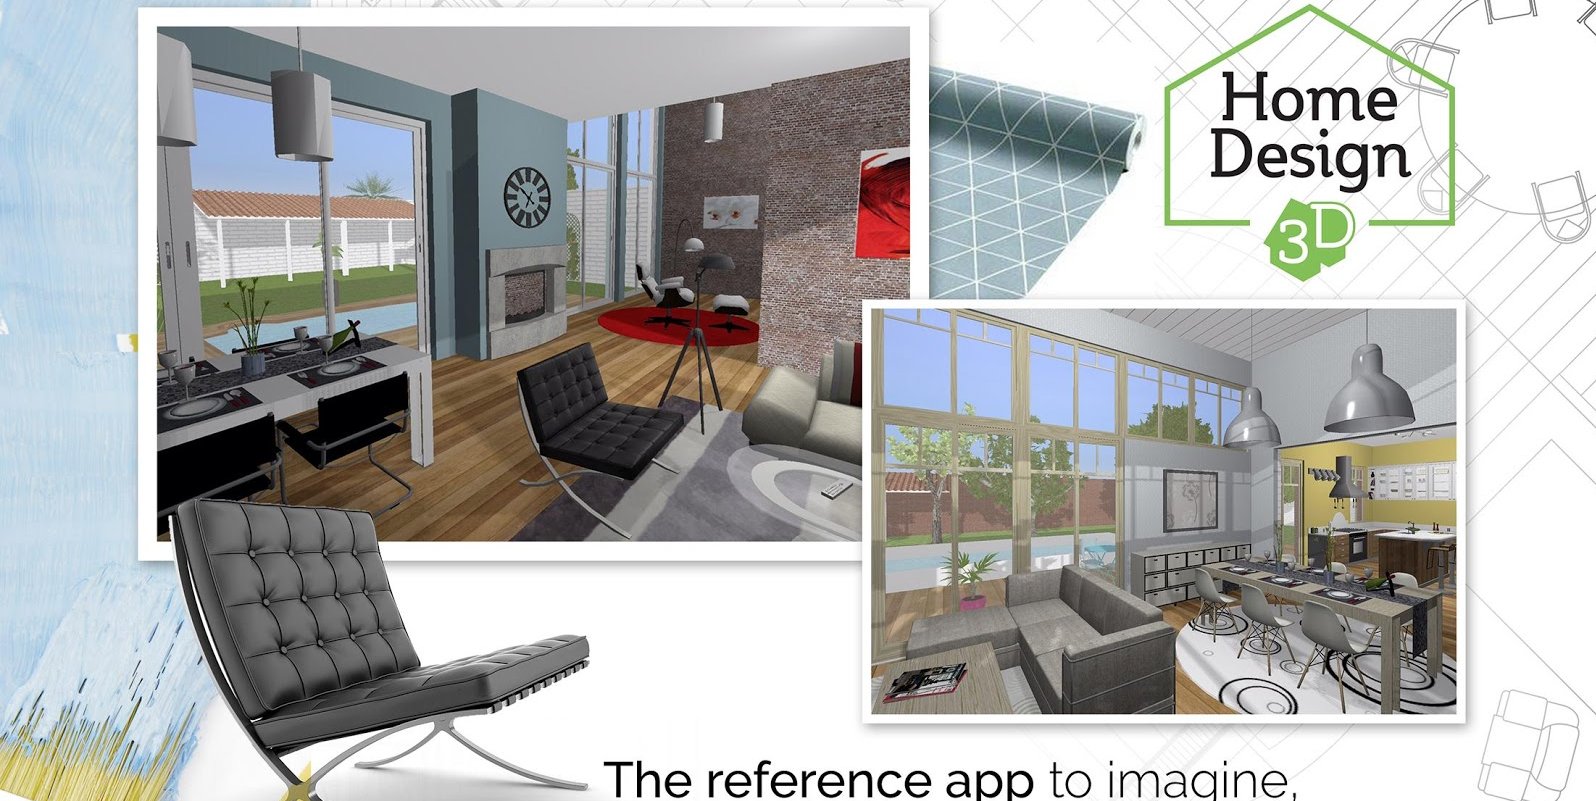 Today's Best IOS & Mac App Deals: Home Design 3D GOLD, Bad